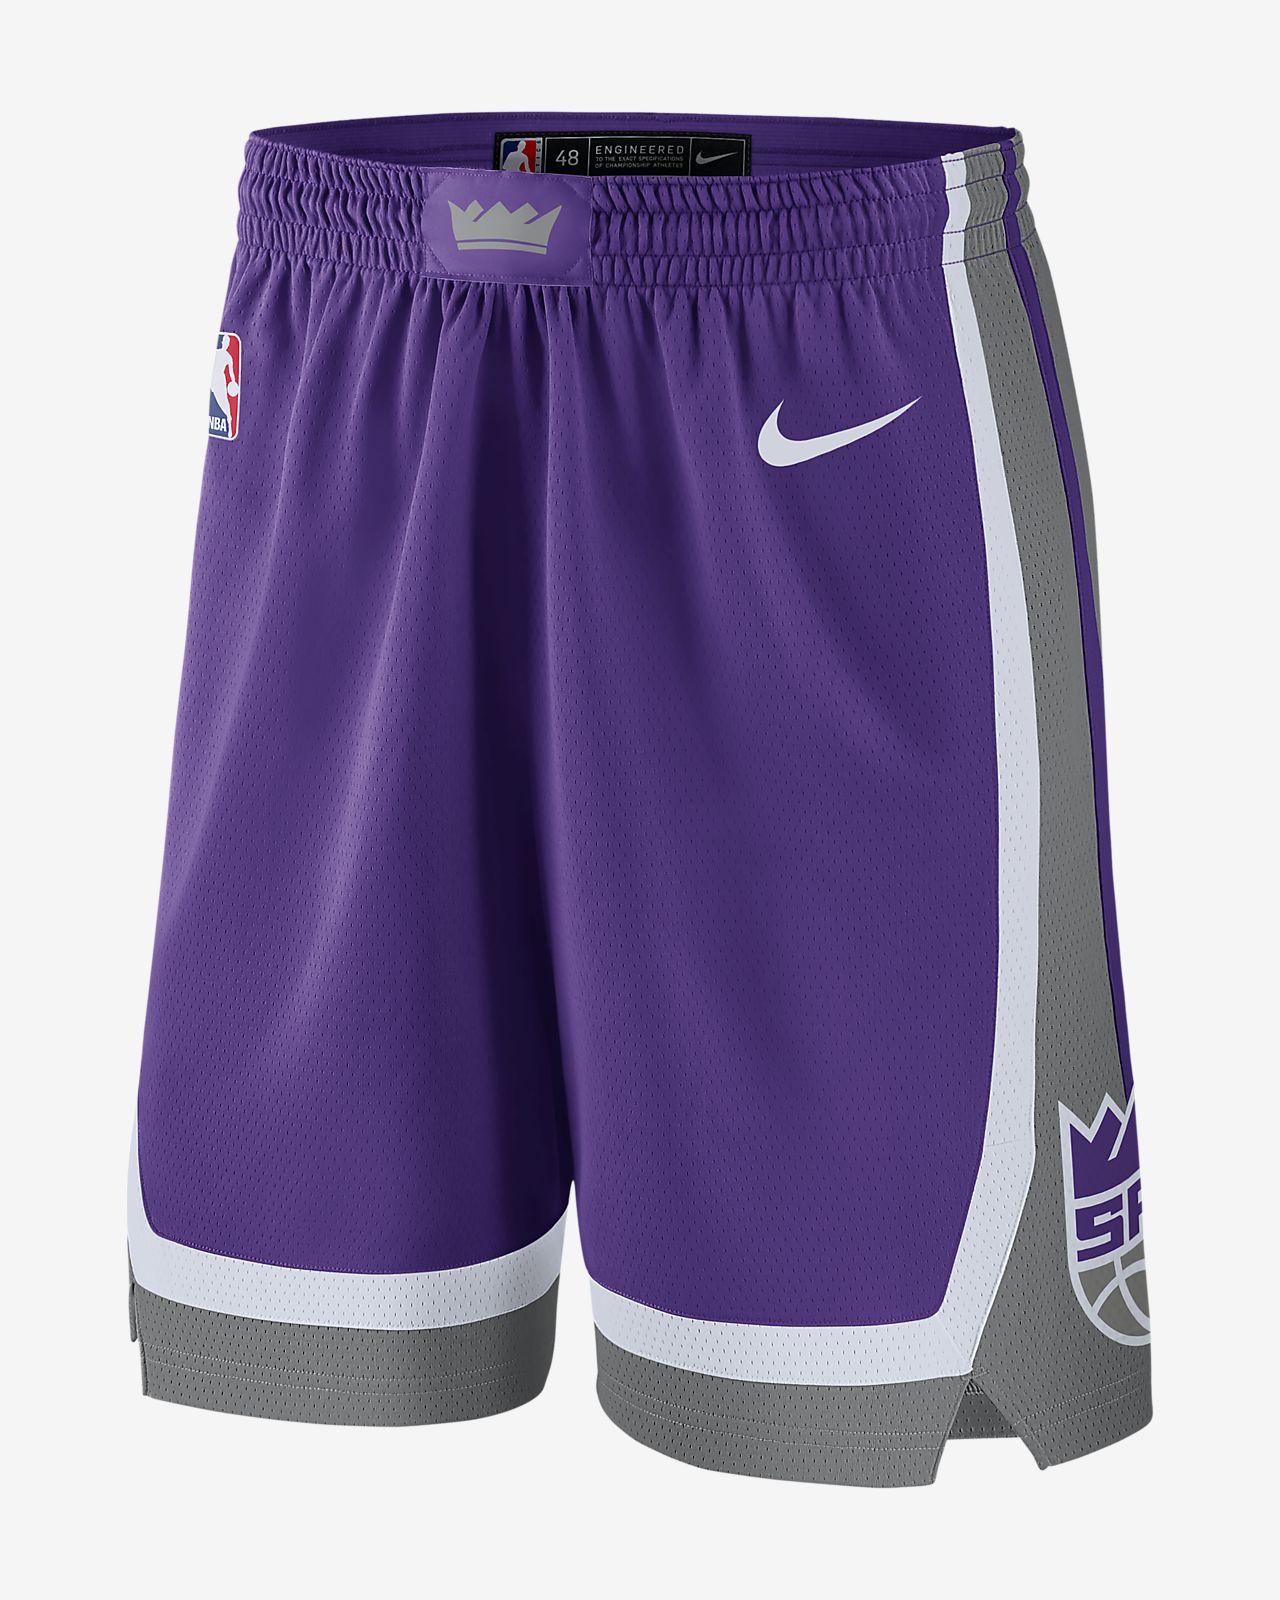 Short NBA Sacramento Kings Nike Icon Edition Swingman Nike pour Homme